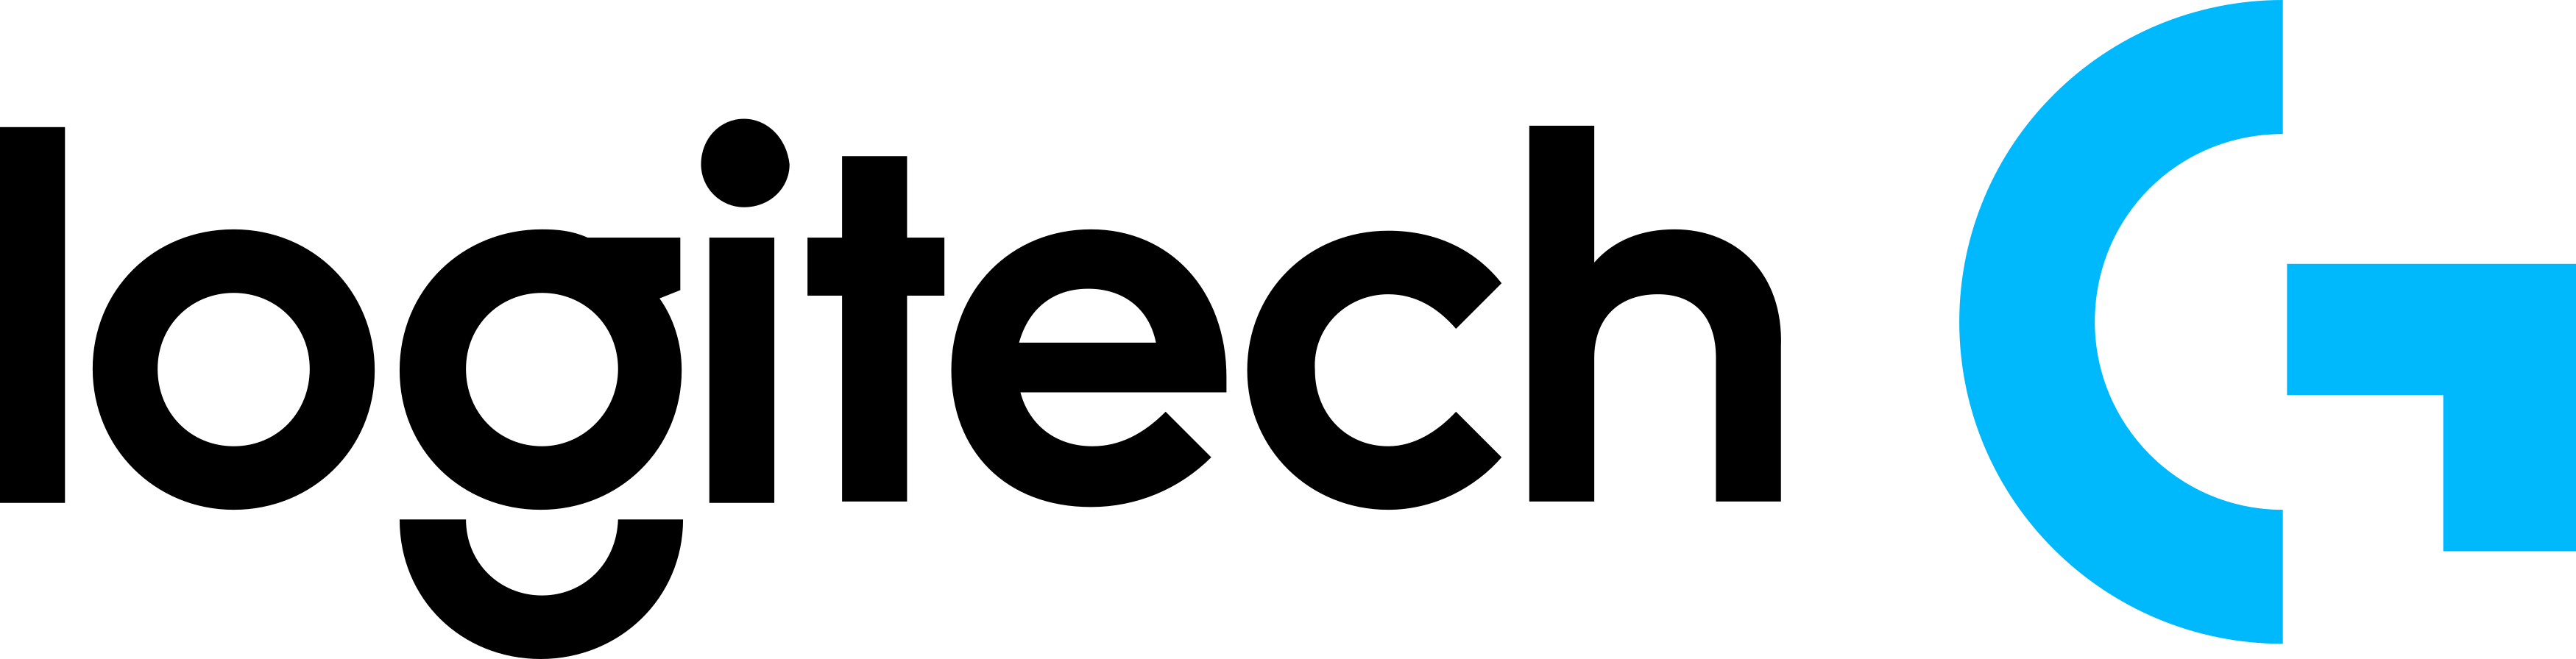 logitech logo - Logitech Logo